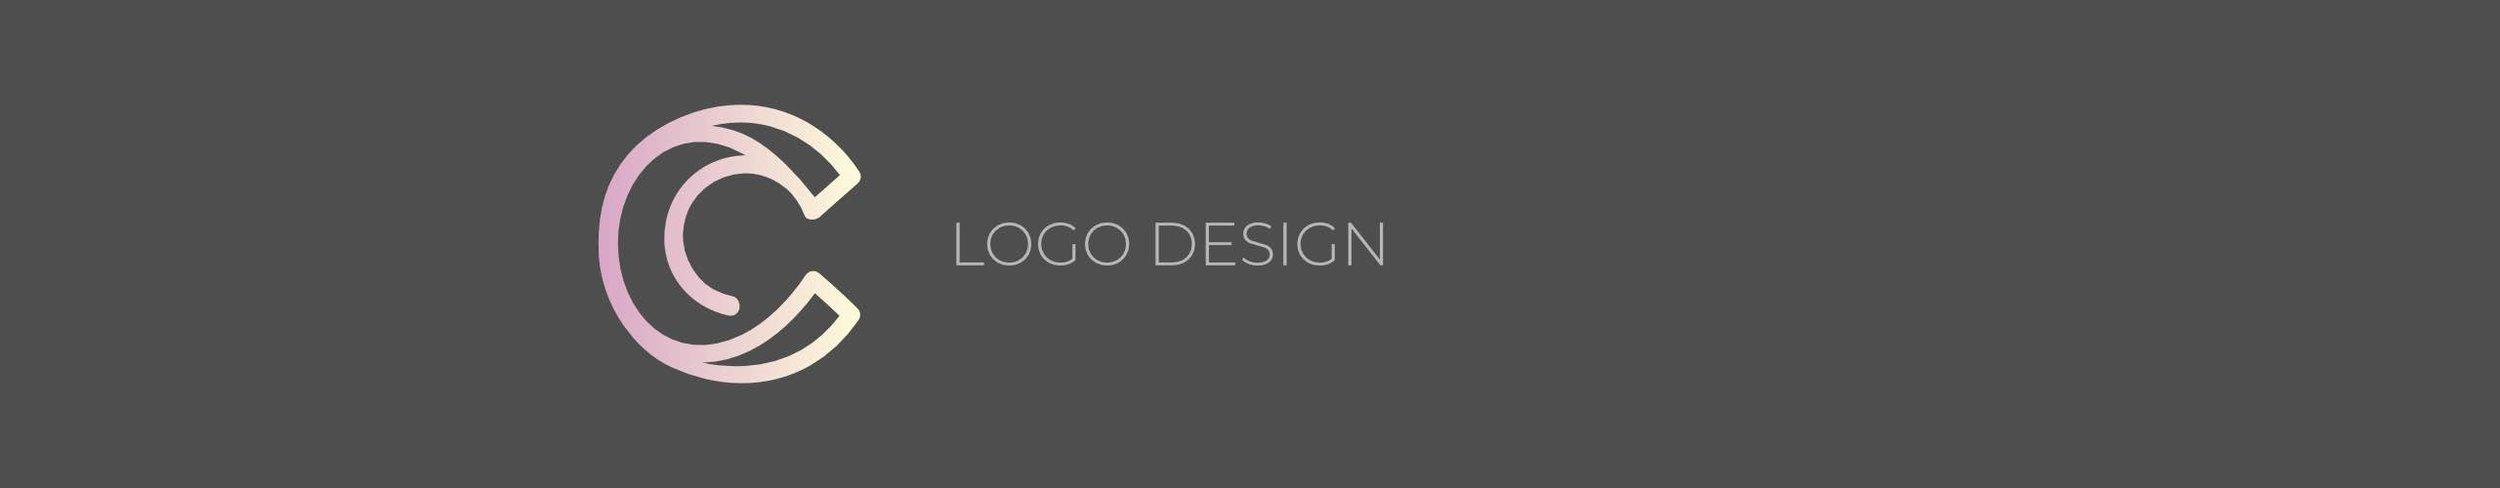 the-creative-co-logo-design-banner.jpg